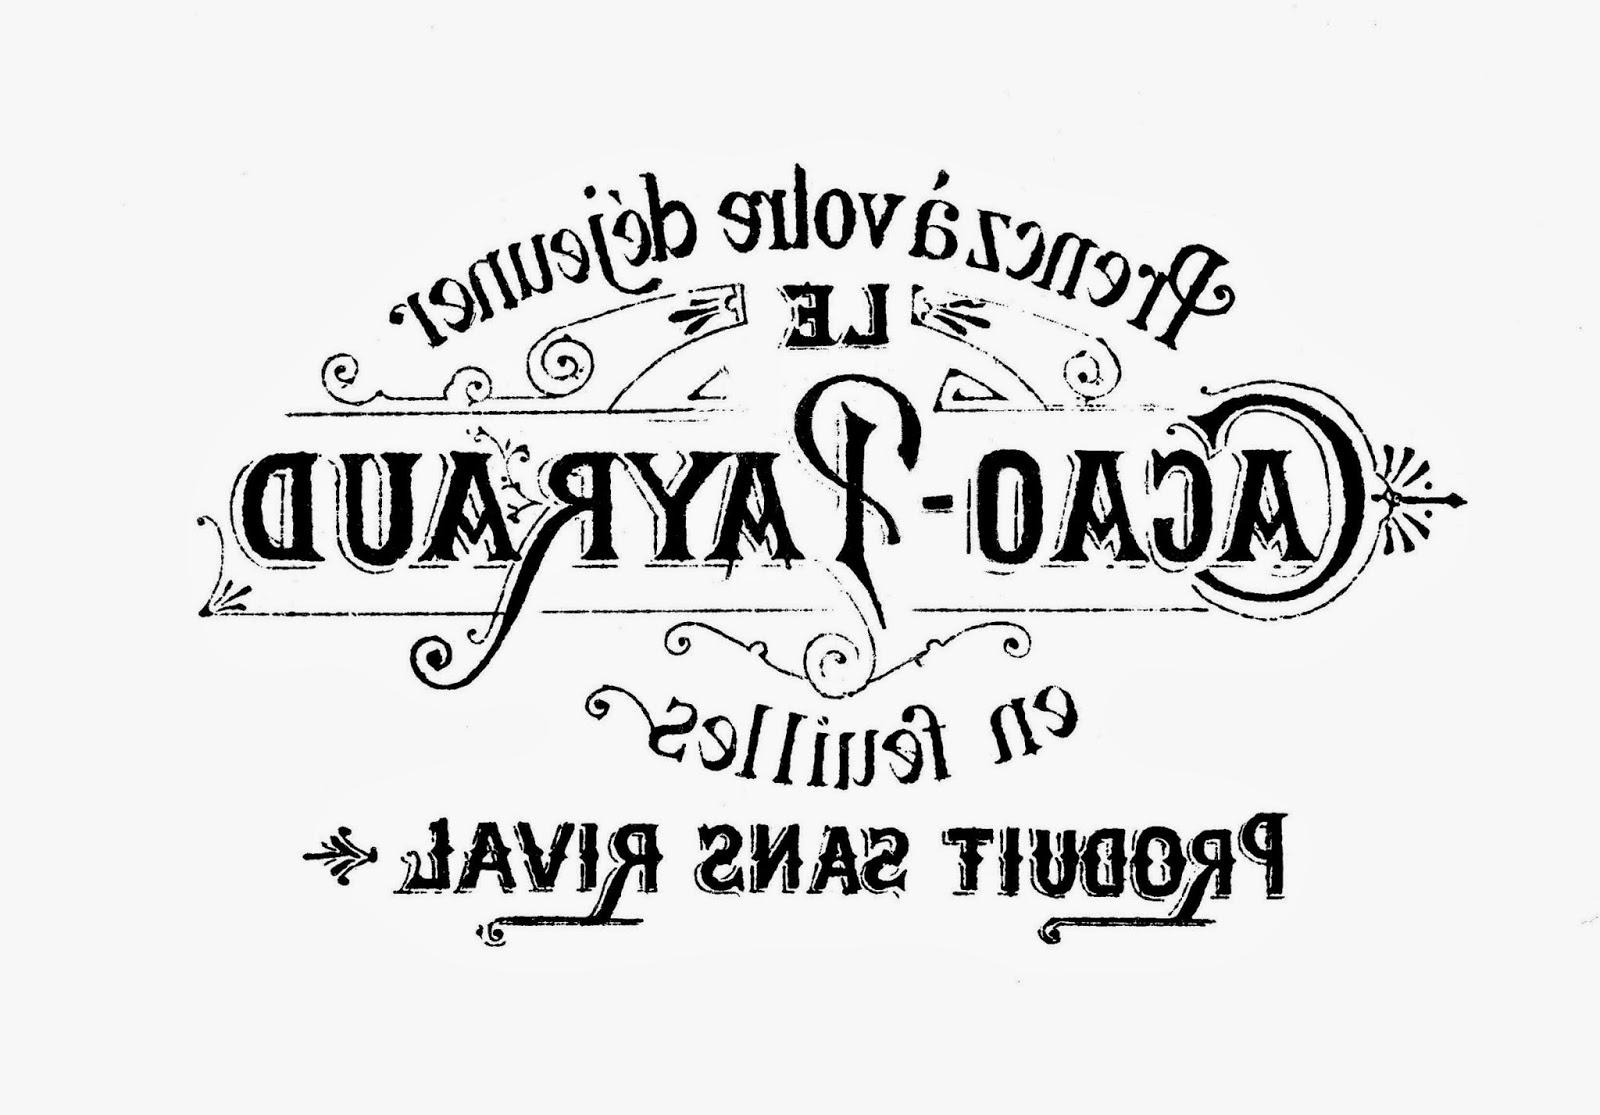 Redoem Vintage French Typography Tray Re Do